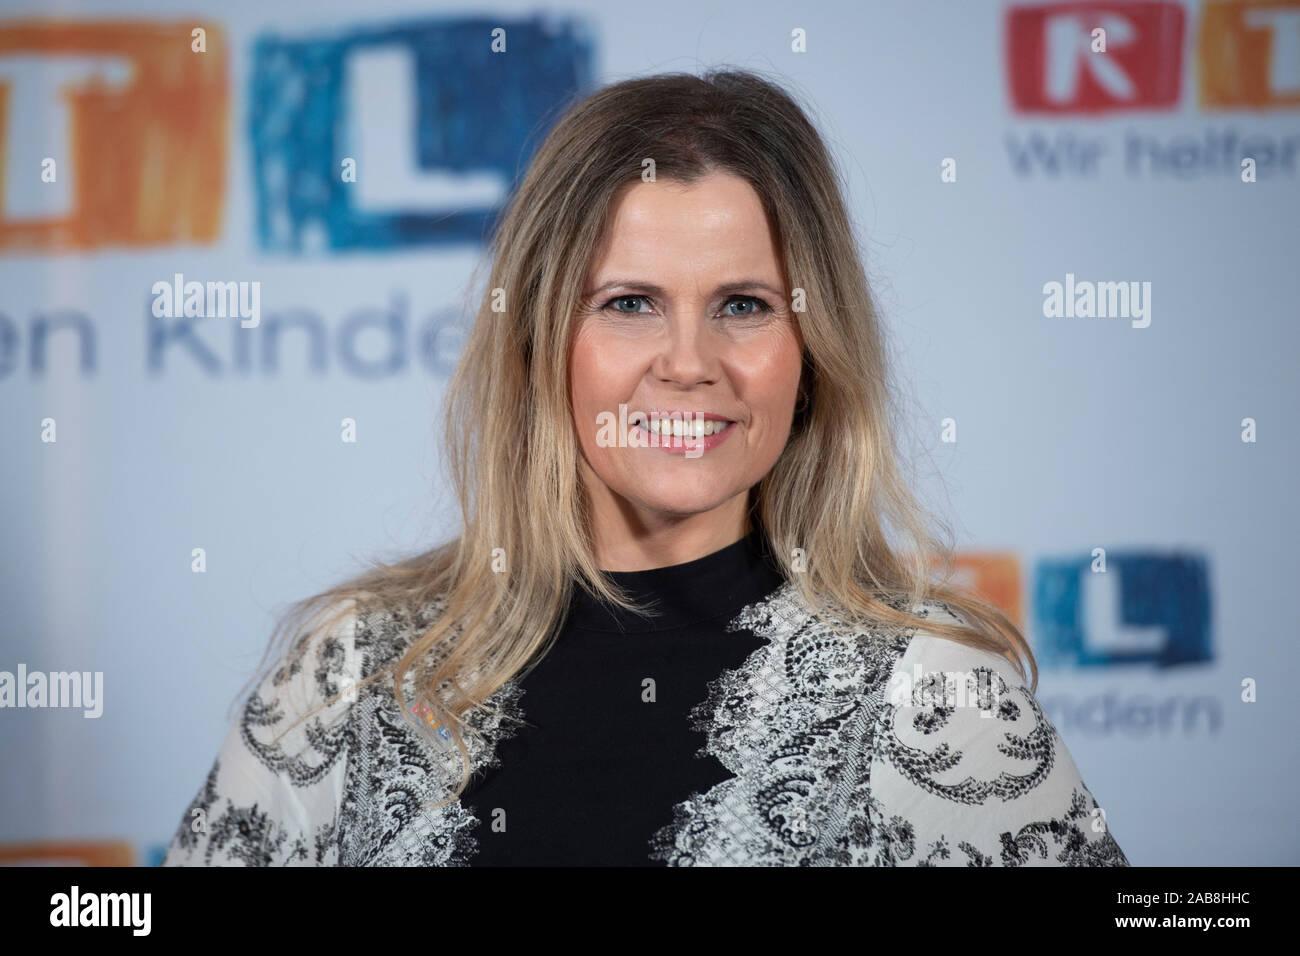 "Michaela SCHAFFRATH, Actress, Portrait, Portrà t, Portrait, Cropped Frame, Single Subject, 24th RTL Spendenmarathon ""Wir helfen Kindern"", TV, 21.-22.11.2019. | Usage worldwide Stock Photo"